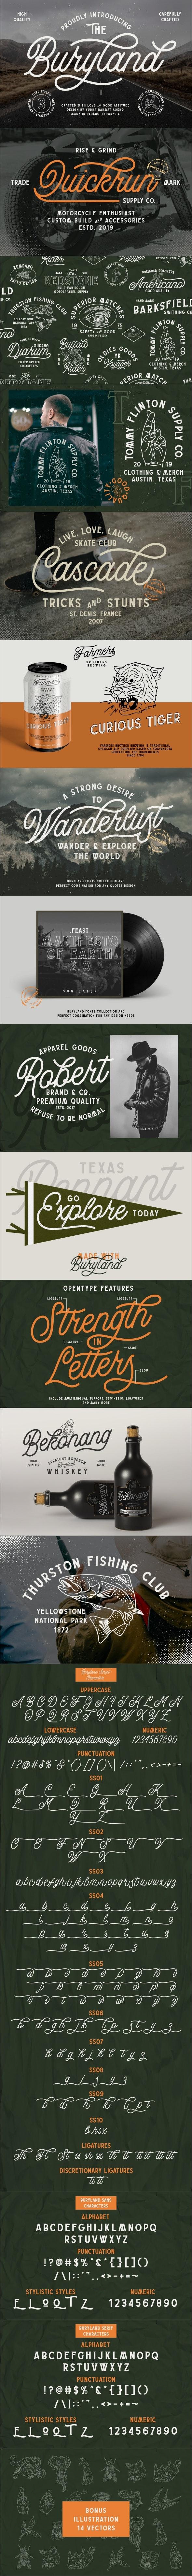 Buryland Typeface Collection - 9 Fonts - Fonts